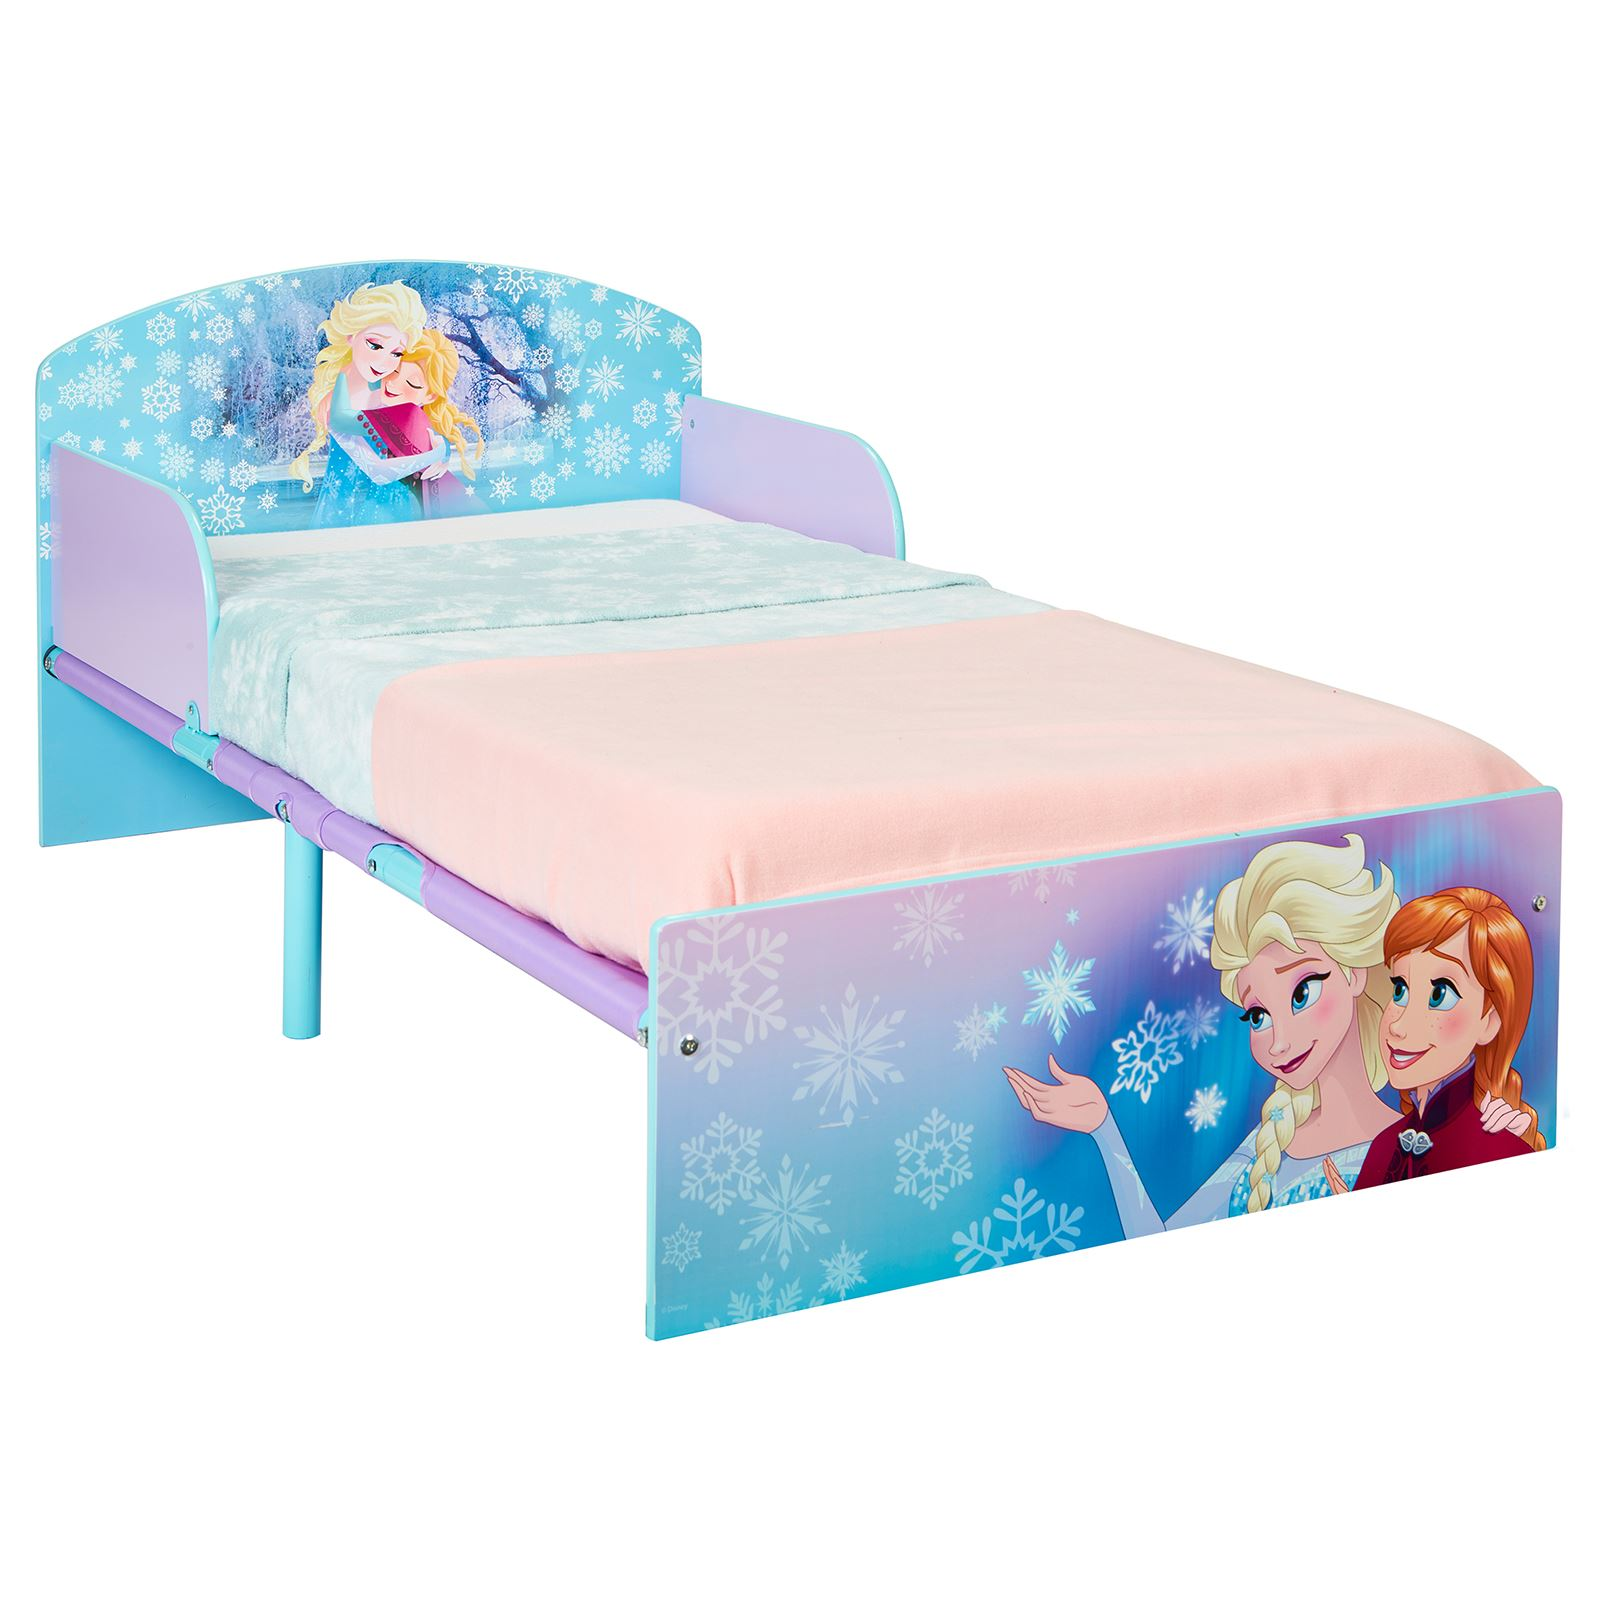 miniatura 9 - KIDS CHARACTER TODDLER BEDS - BOYS GIRLS BEDROOM DISNEY